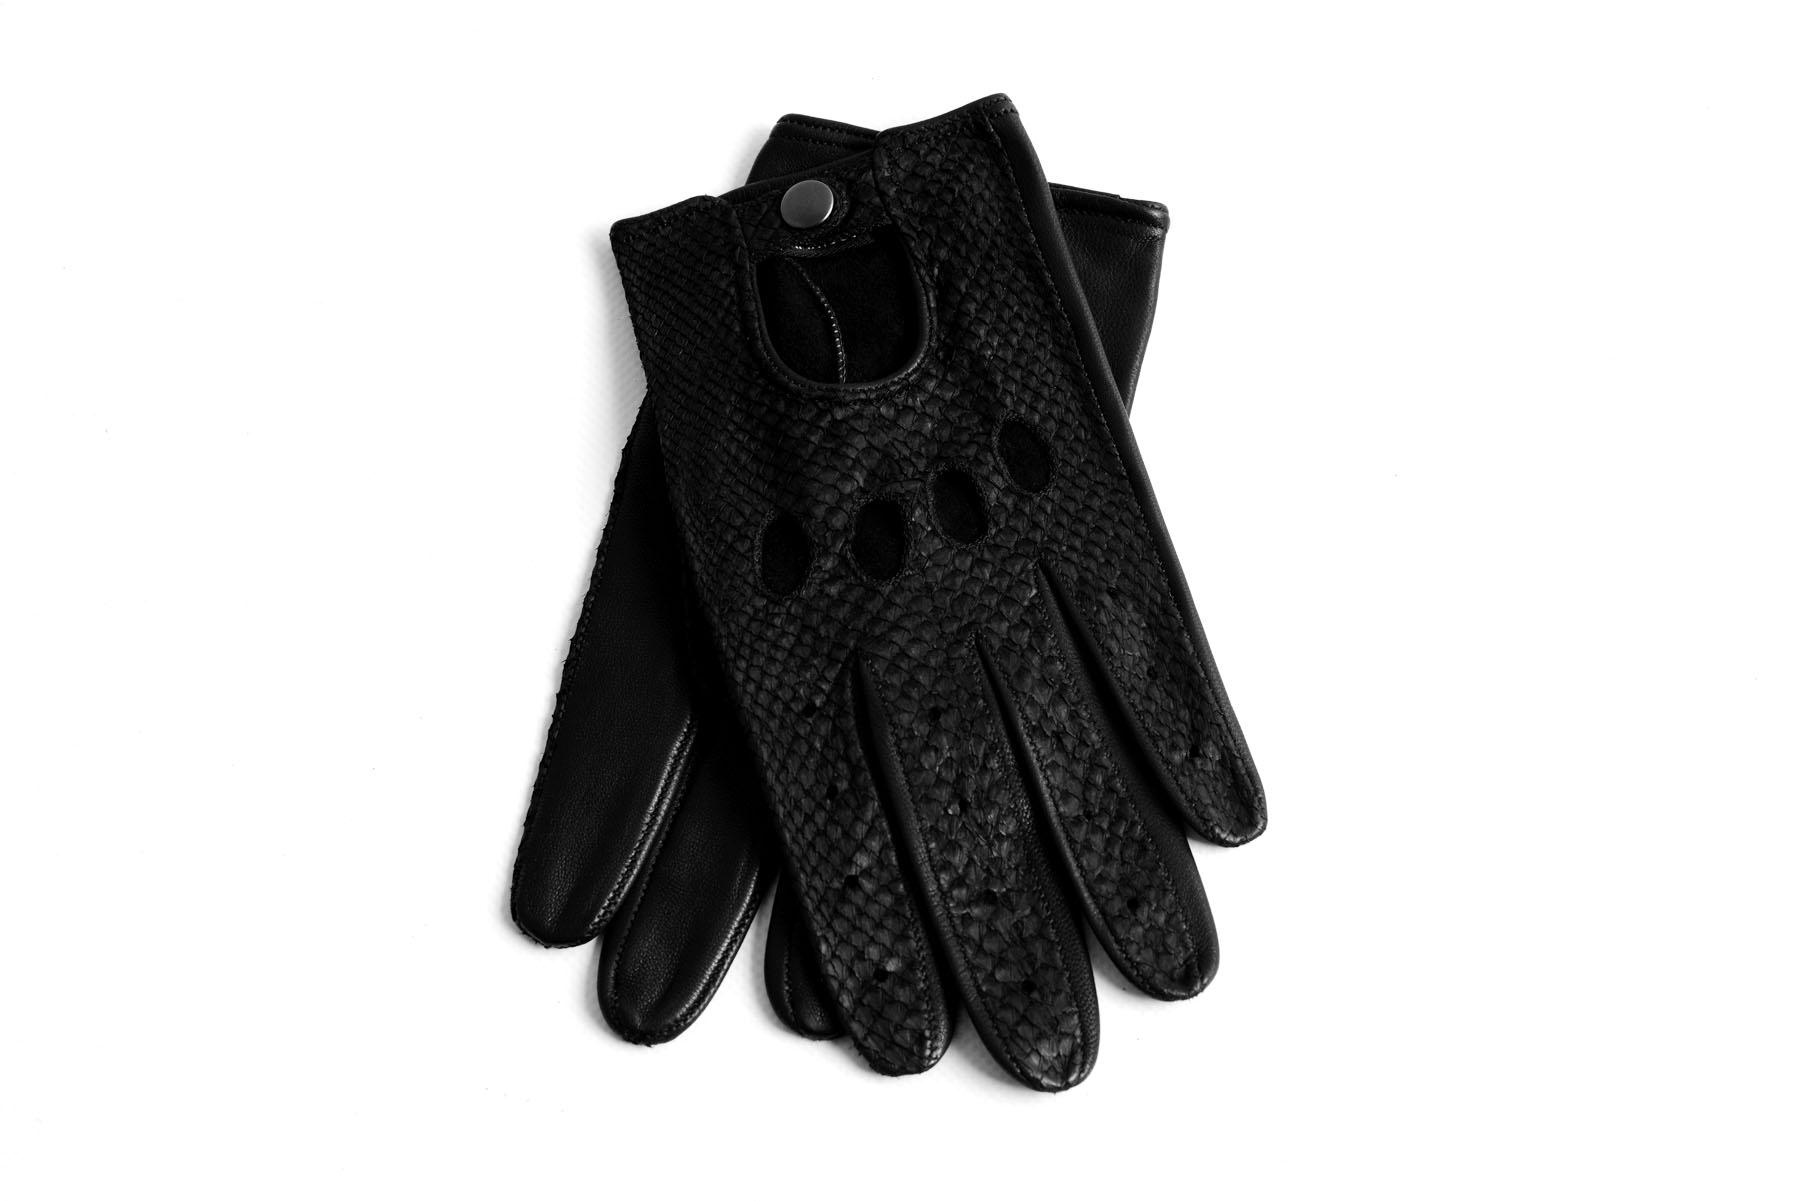 Mahiout Austin driving gloves in salmon skin